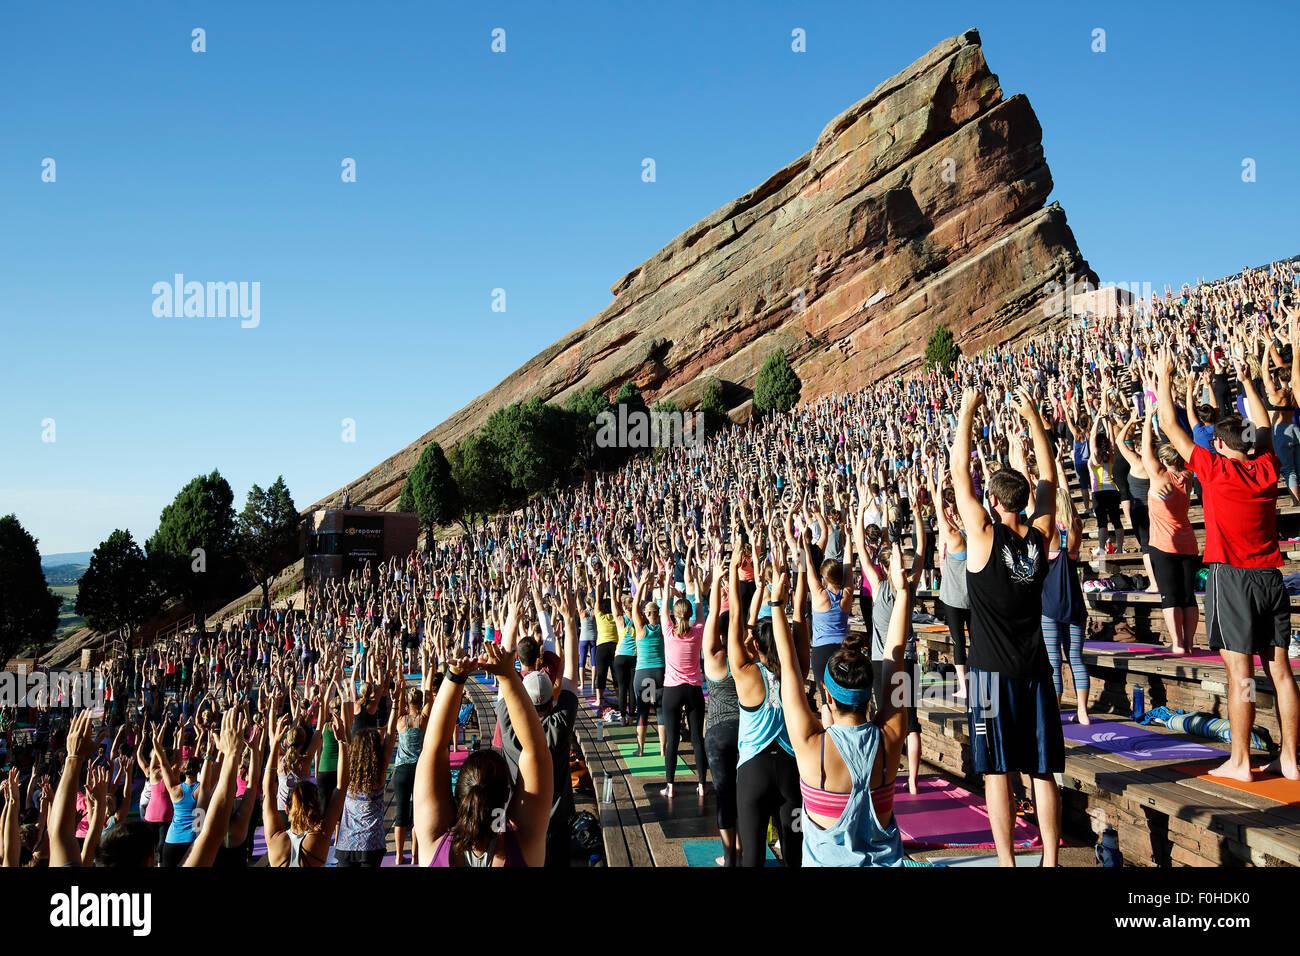 Yoga practitioners, Yoga on The Rocks, Red Rocks Amphitheatre, Morrison, Colorado USA Stock Photo